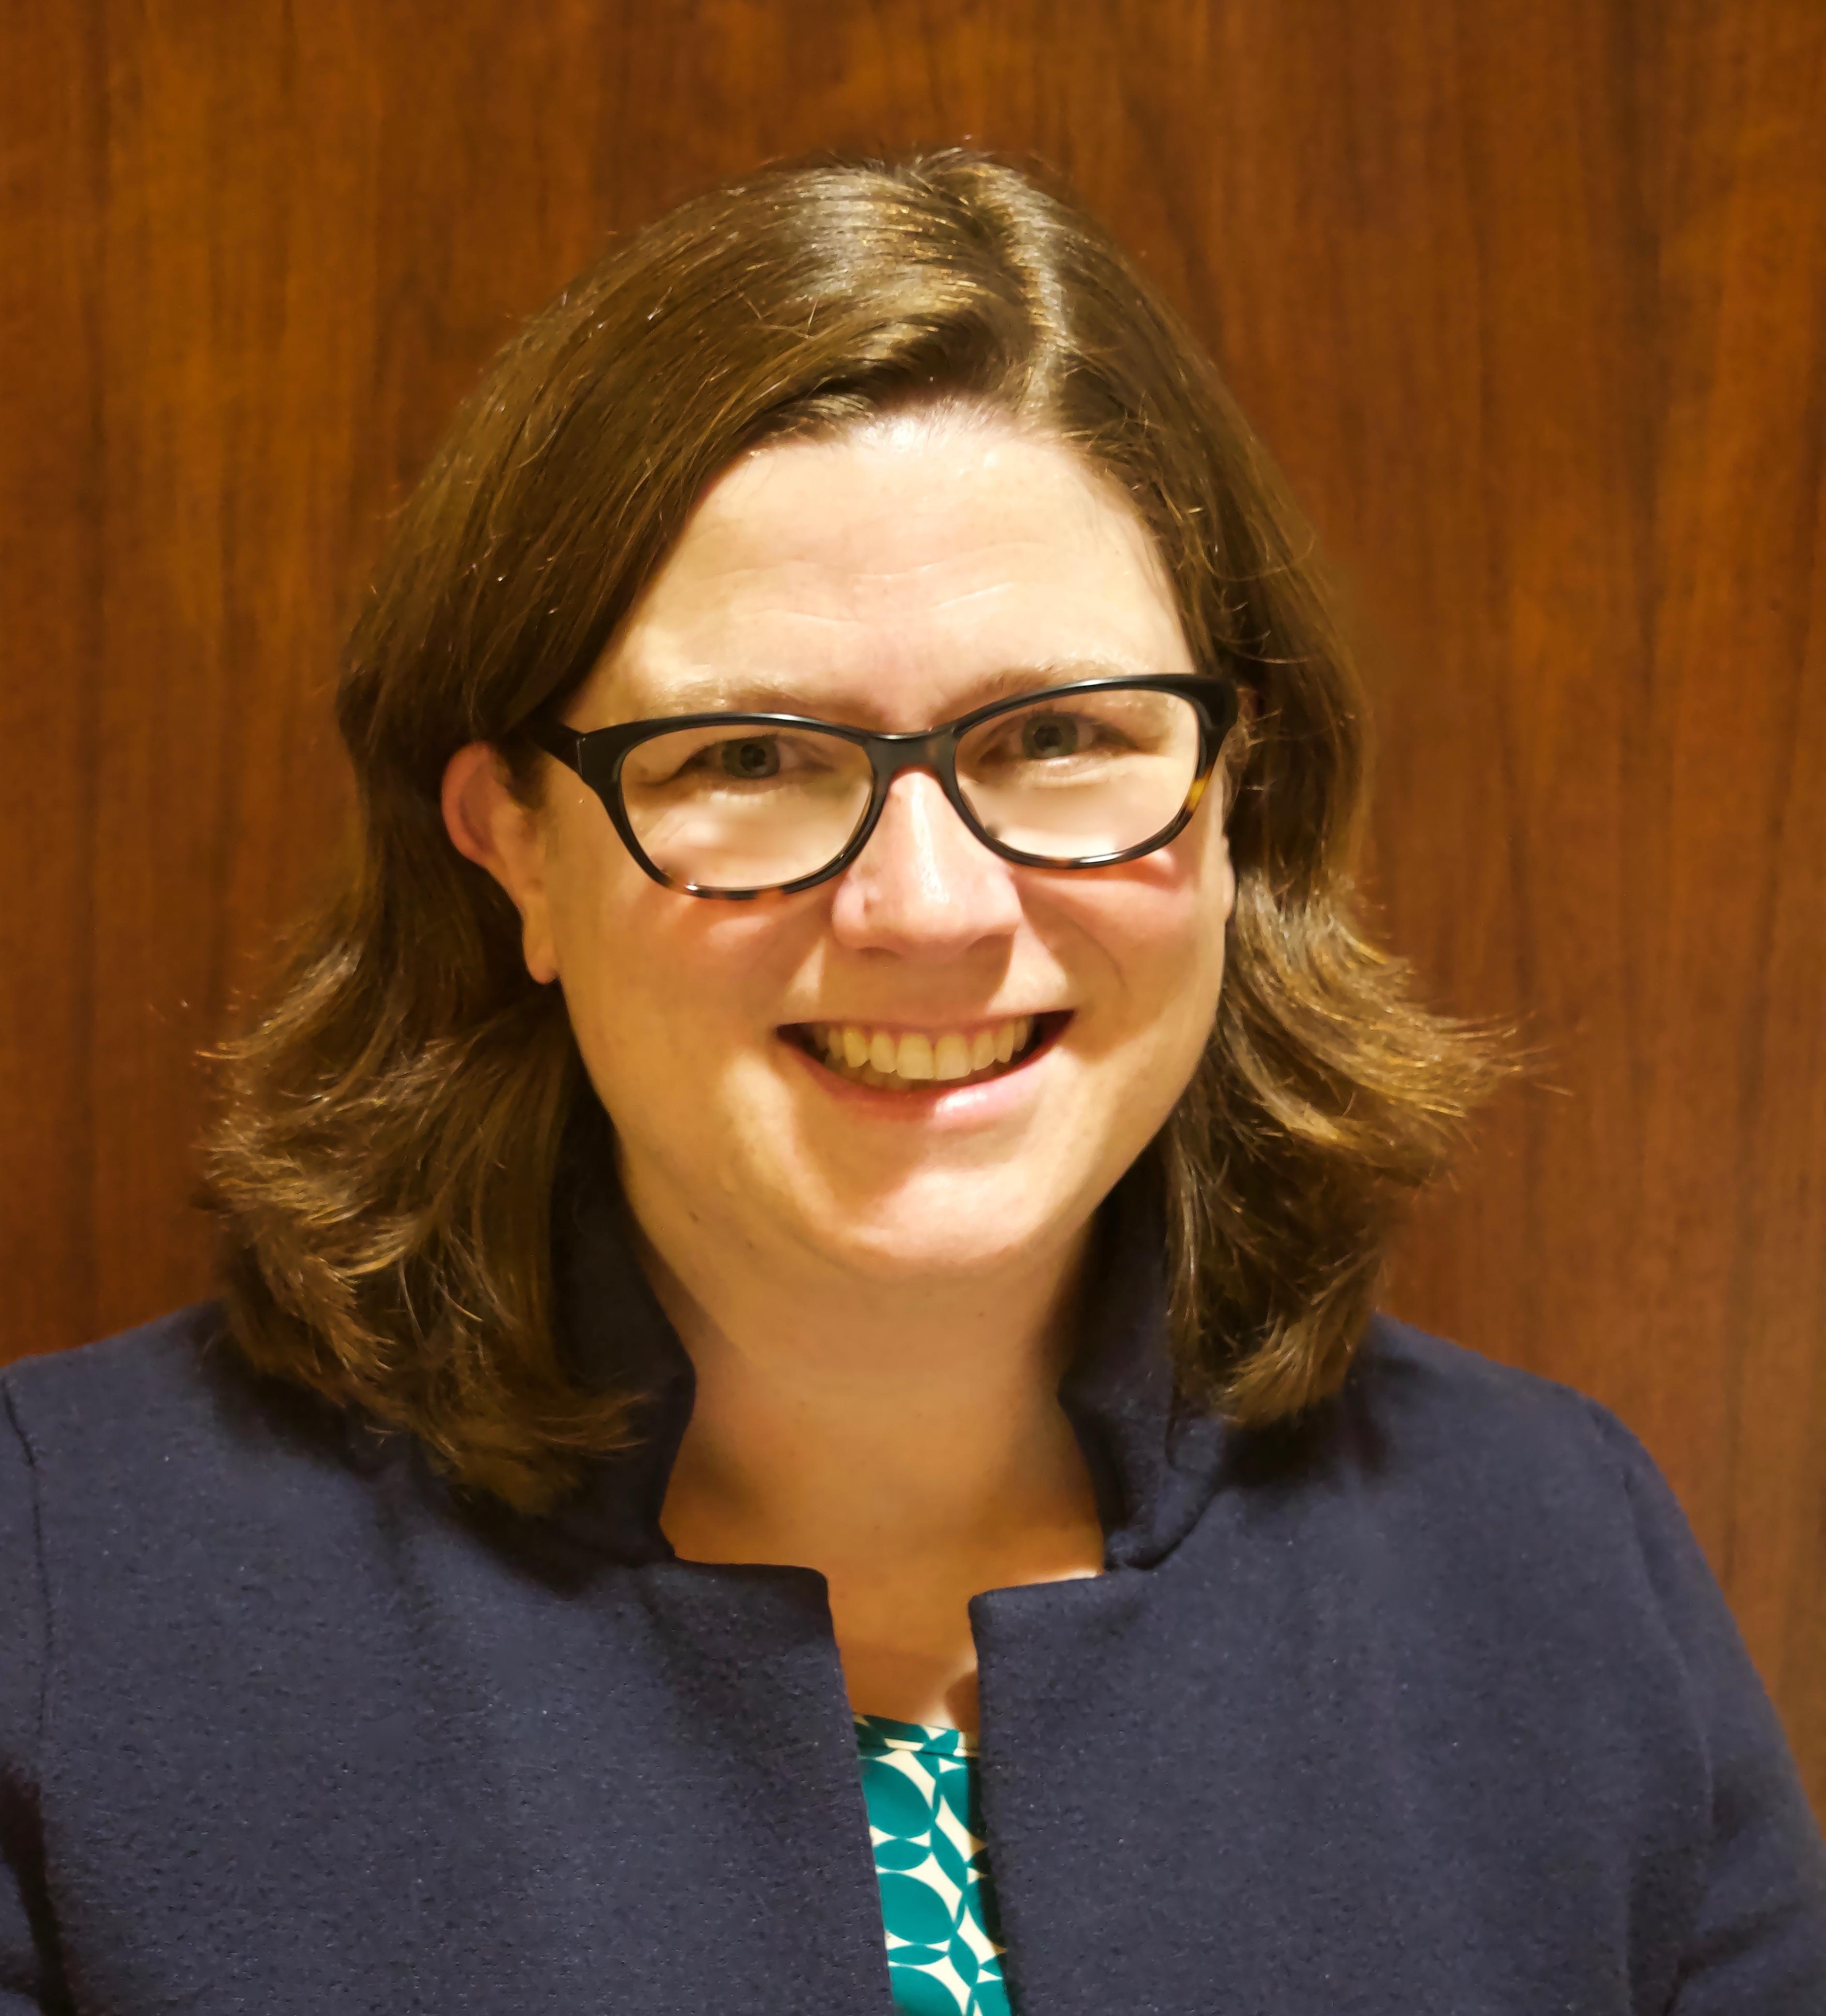 Photo of Amy Zubko